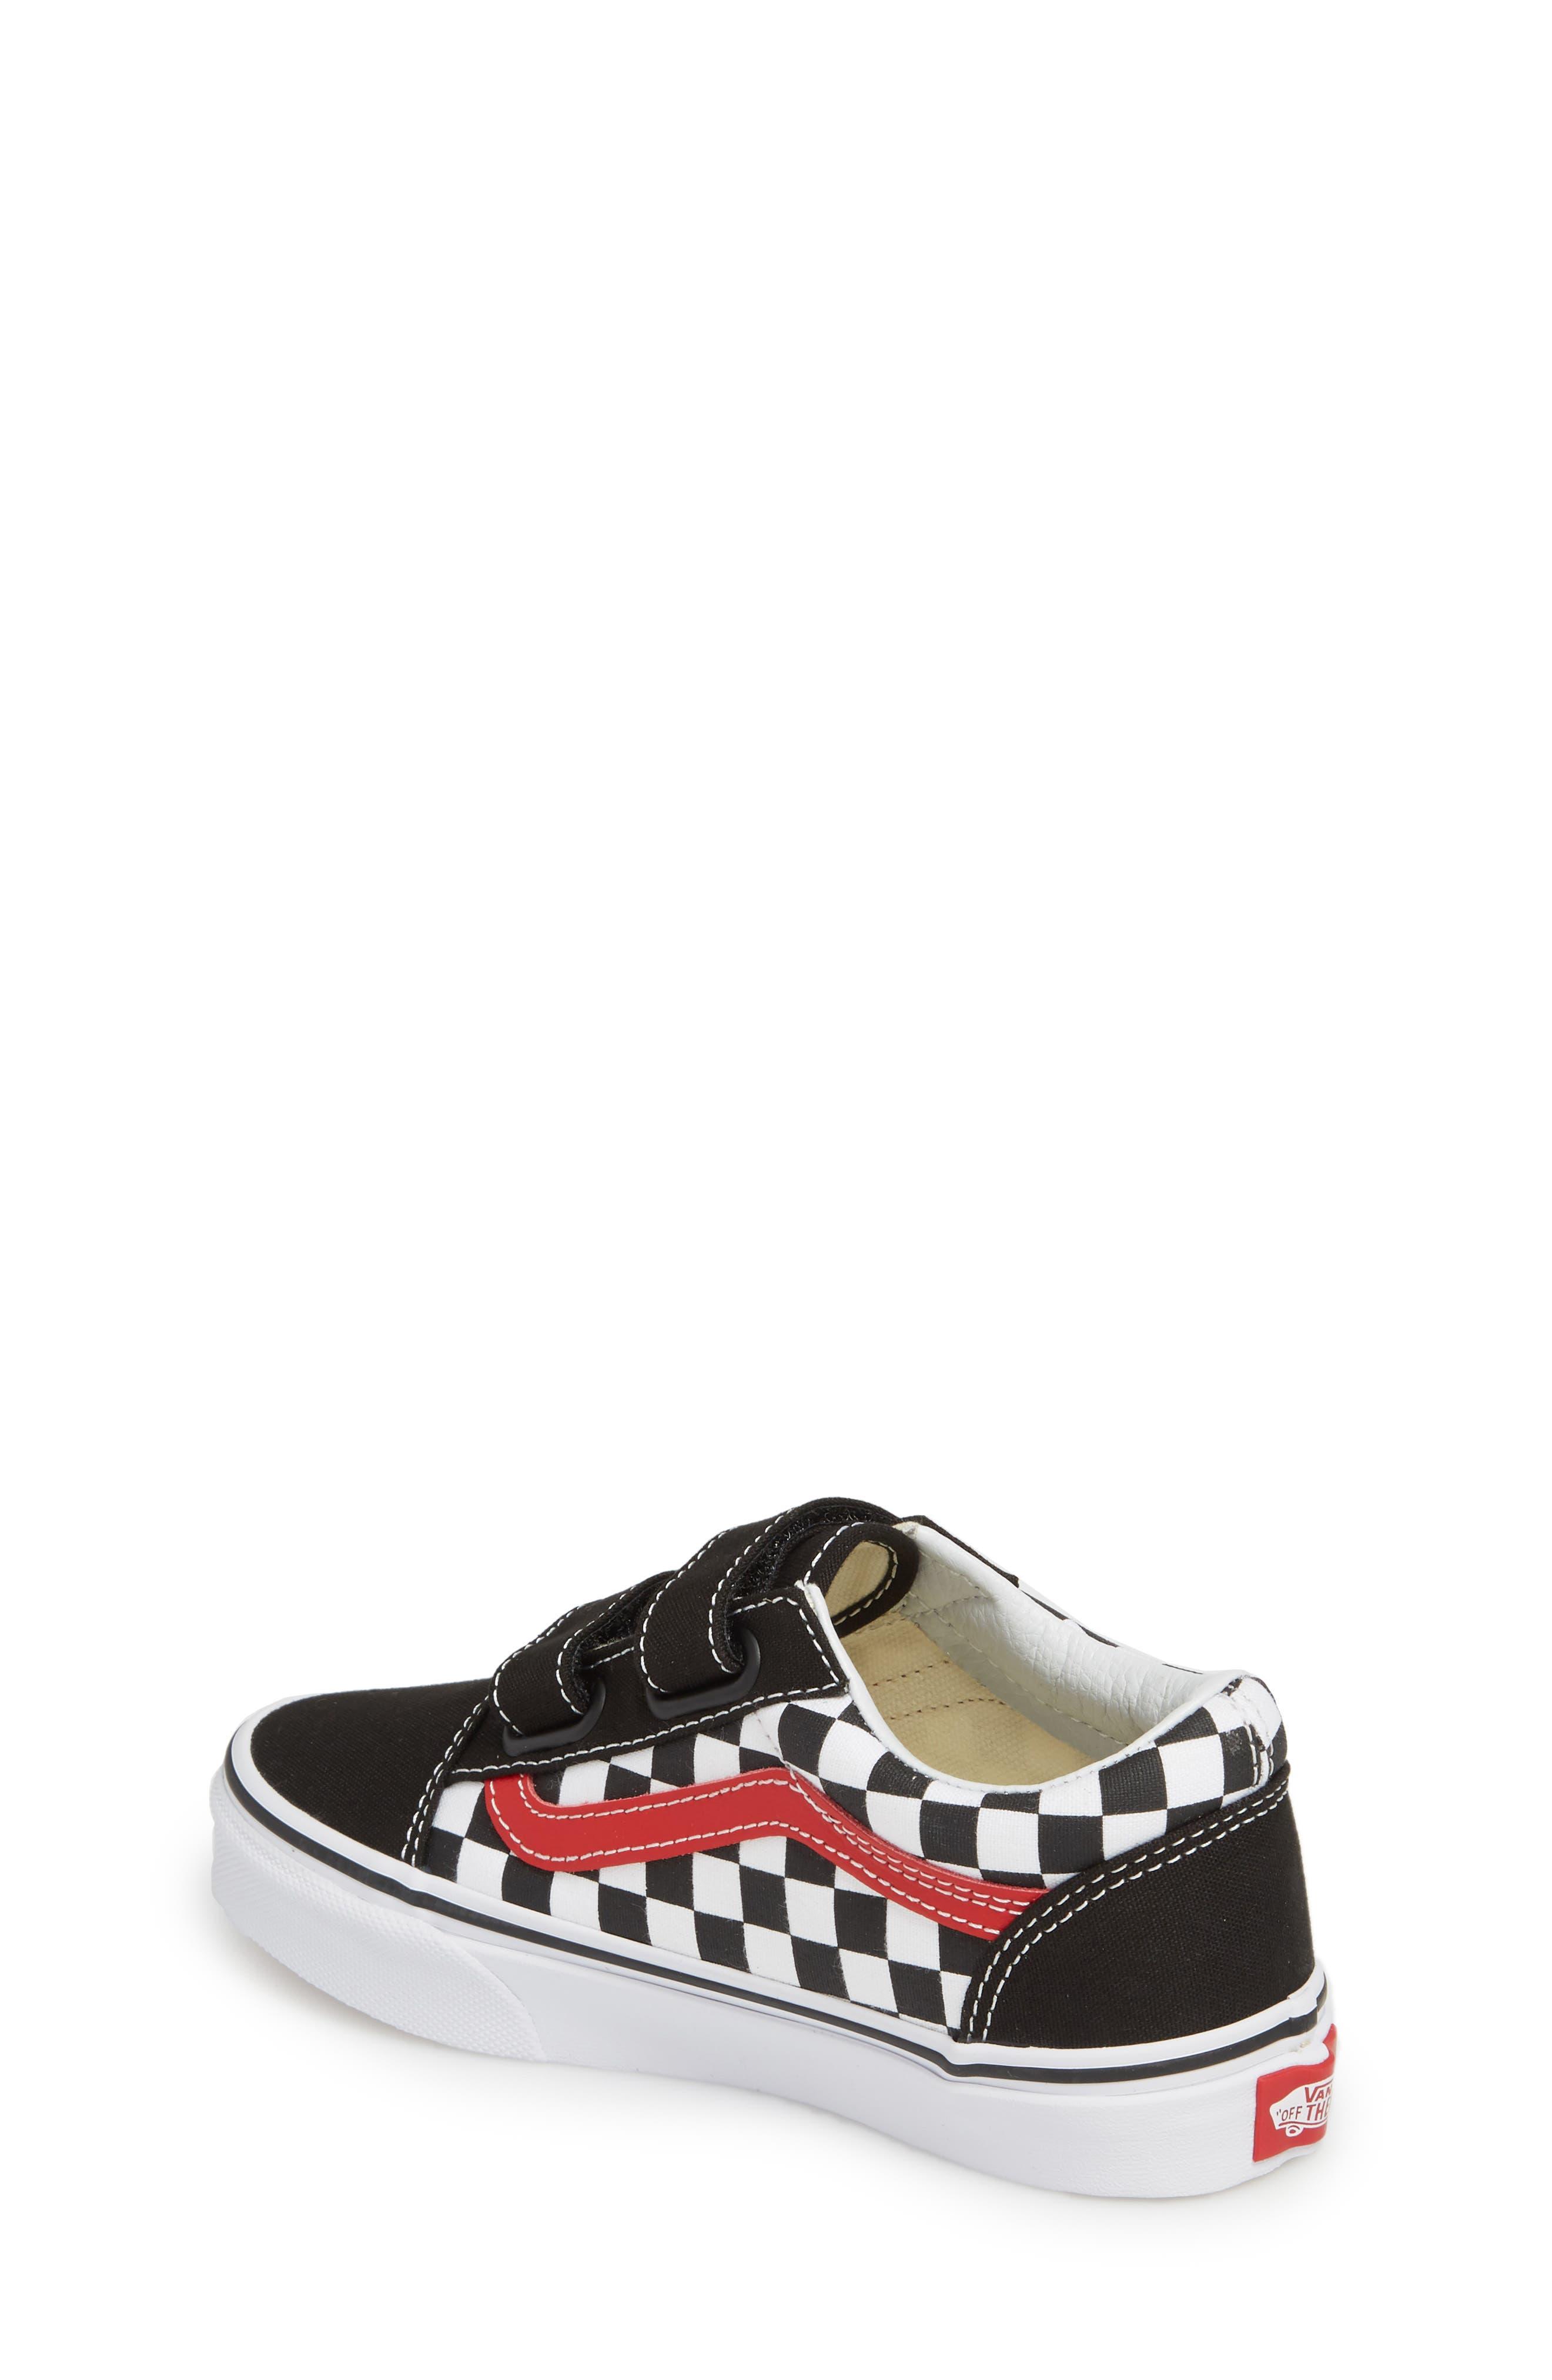 Old Skool V Sneaker,                             Alternate thumbnail 2, color,                             CHECKERBOARD BLACK/ RED/ WHITE